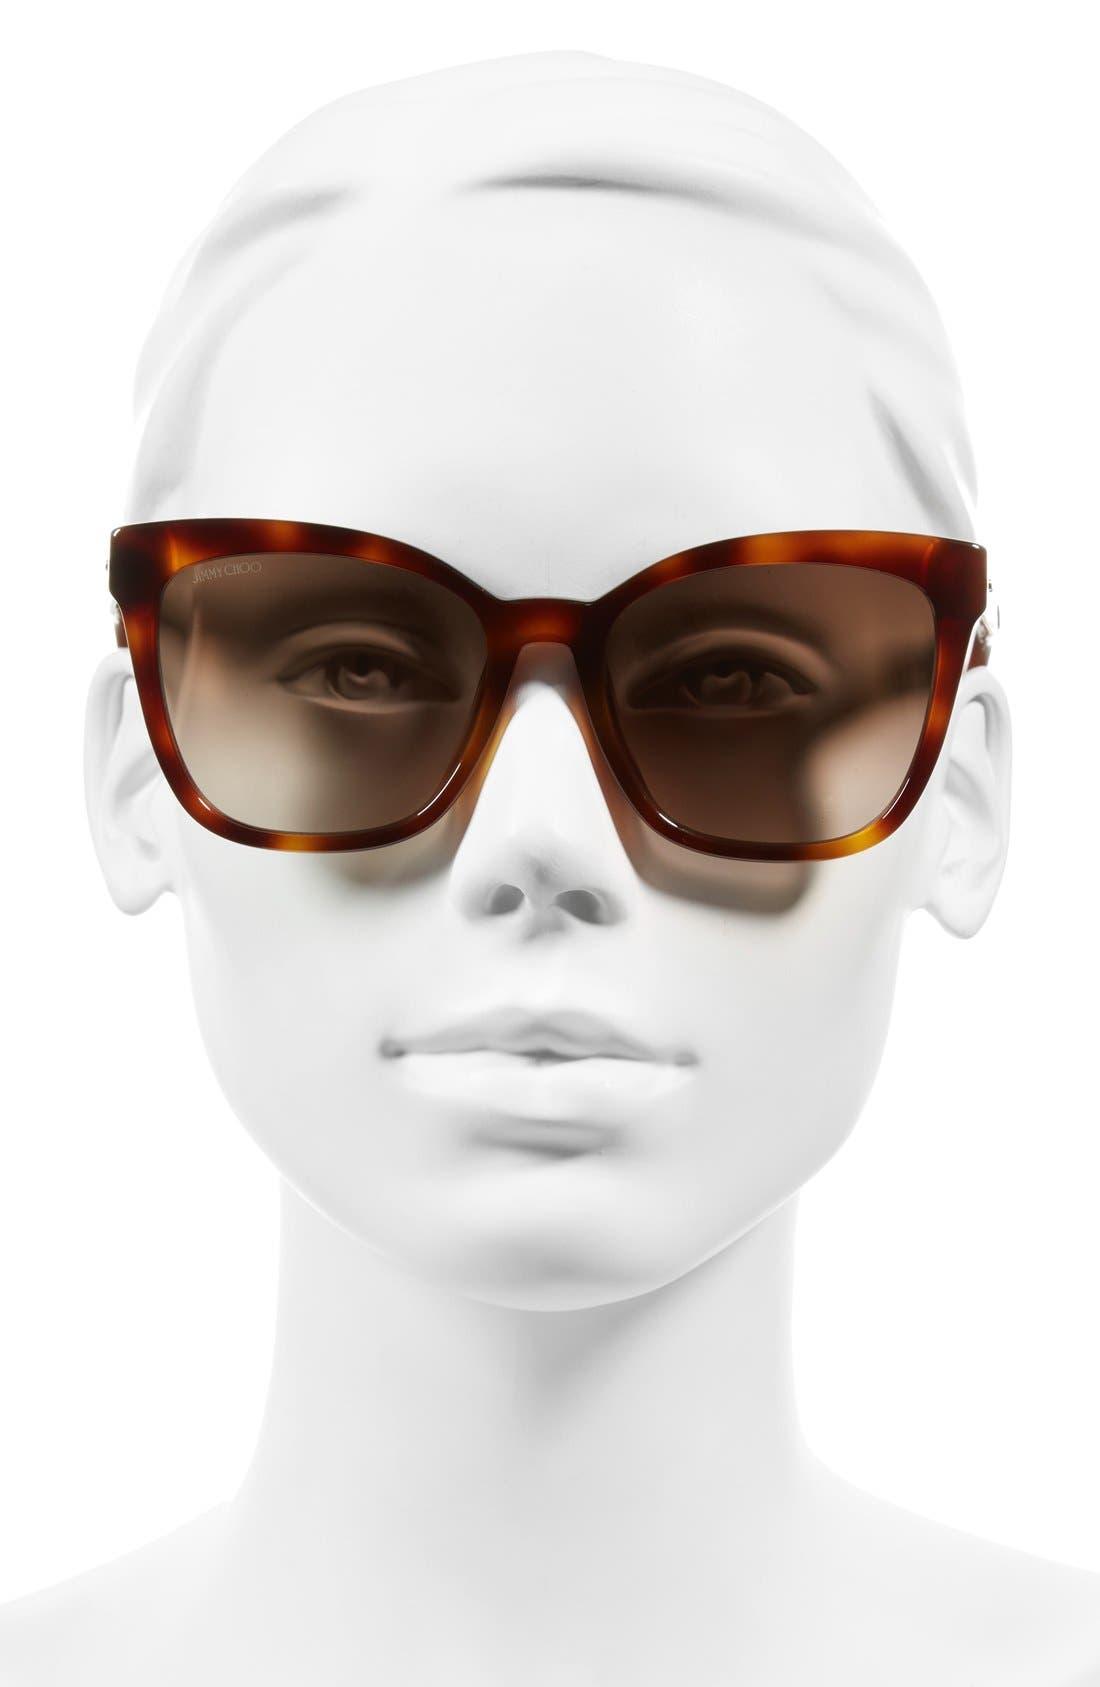 55mm Retro Sunglasses,                             Alternate thumbnail 4, color,